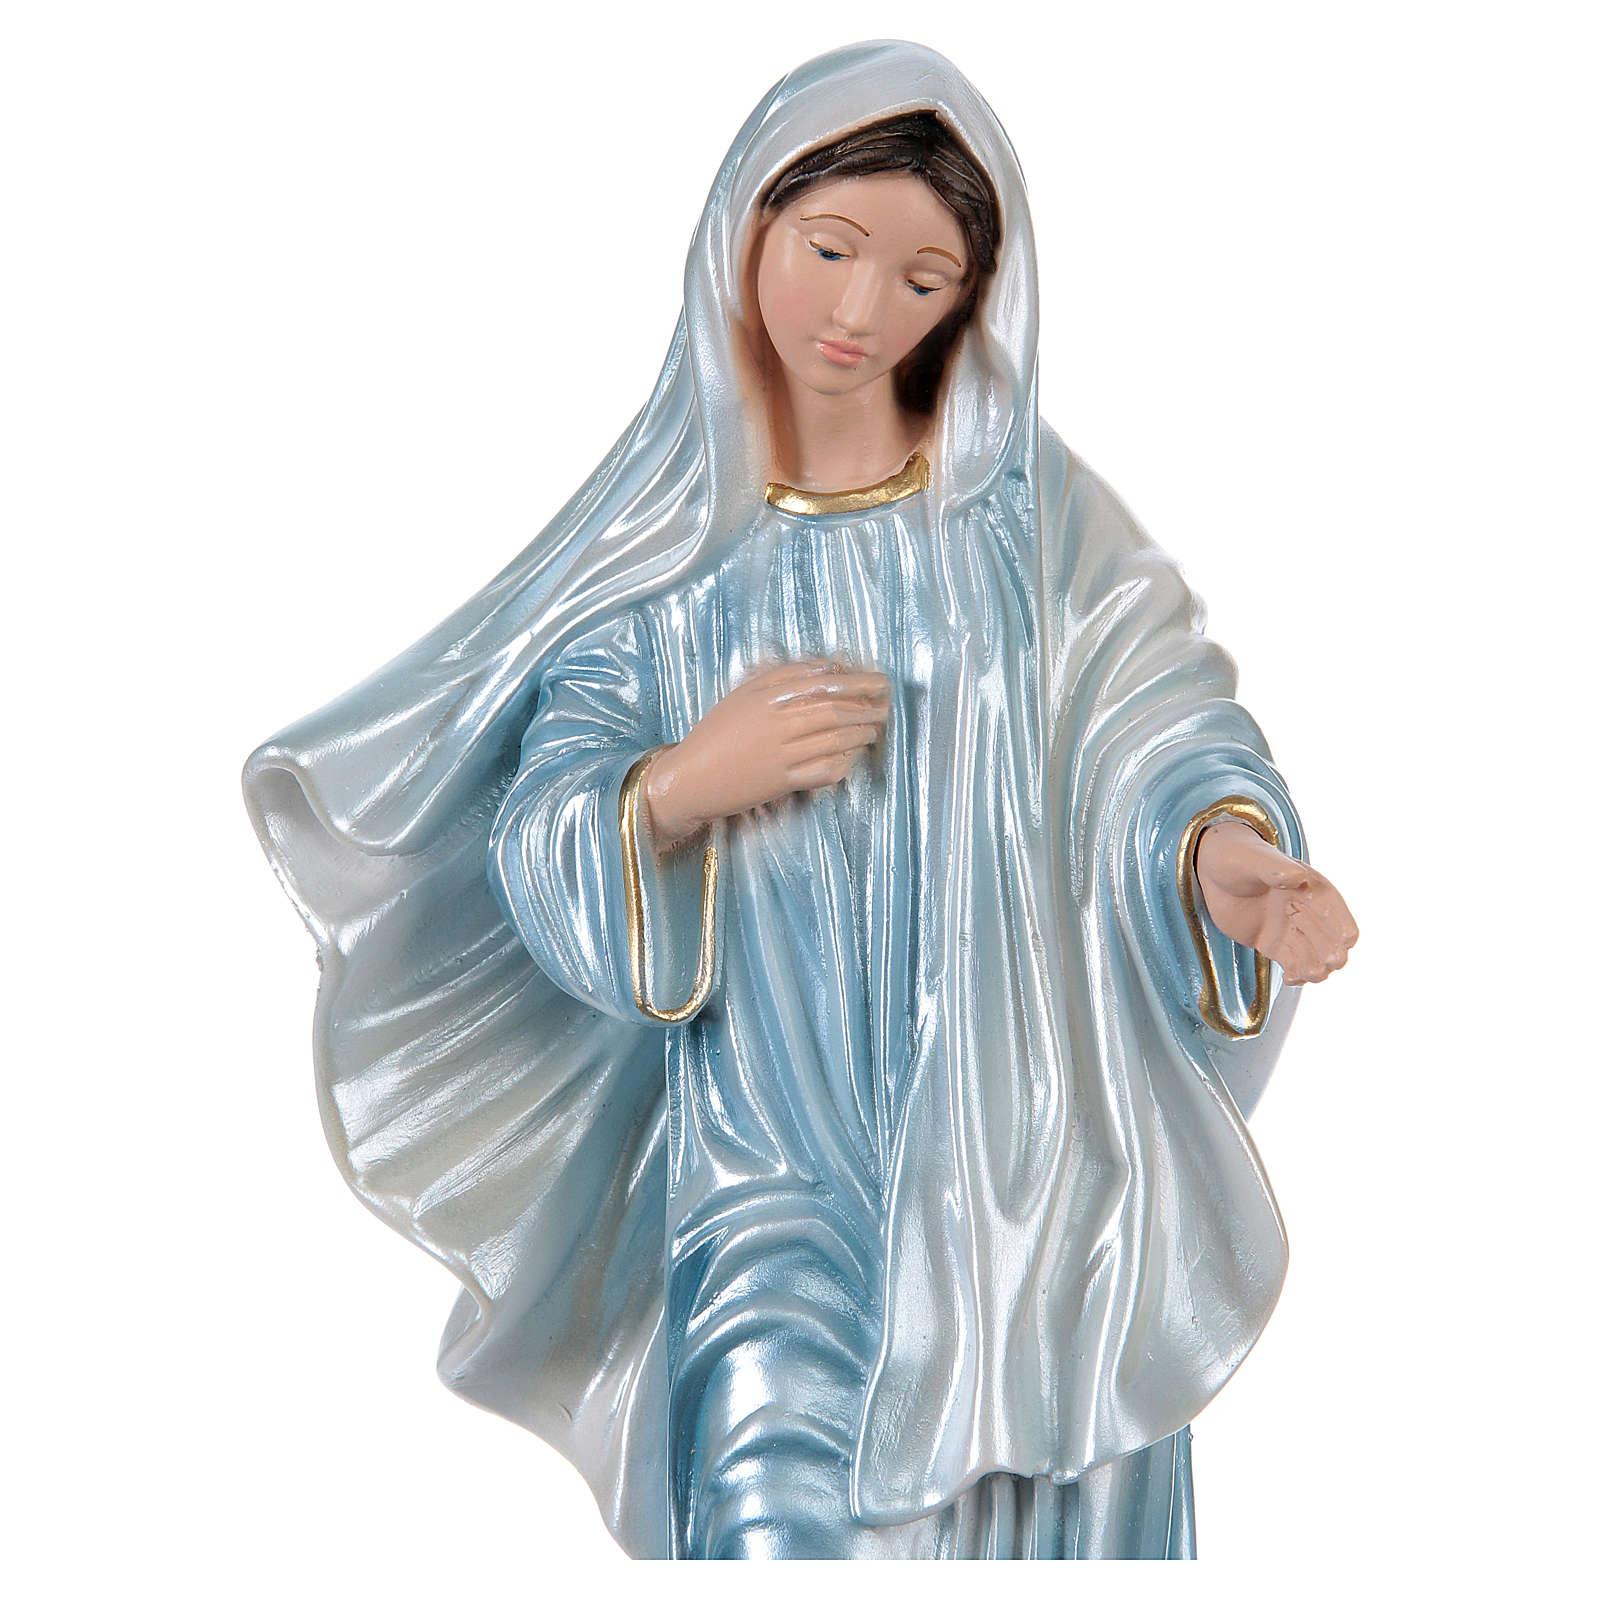 Estatua yeso nacarado Virgen de Medjugorje 35 cm 4